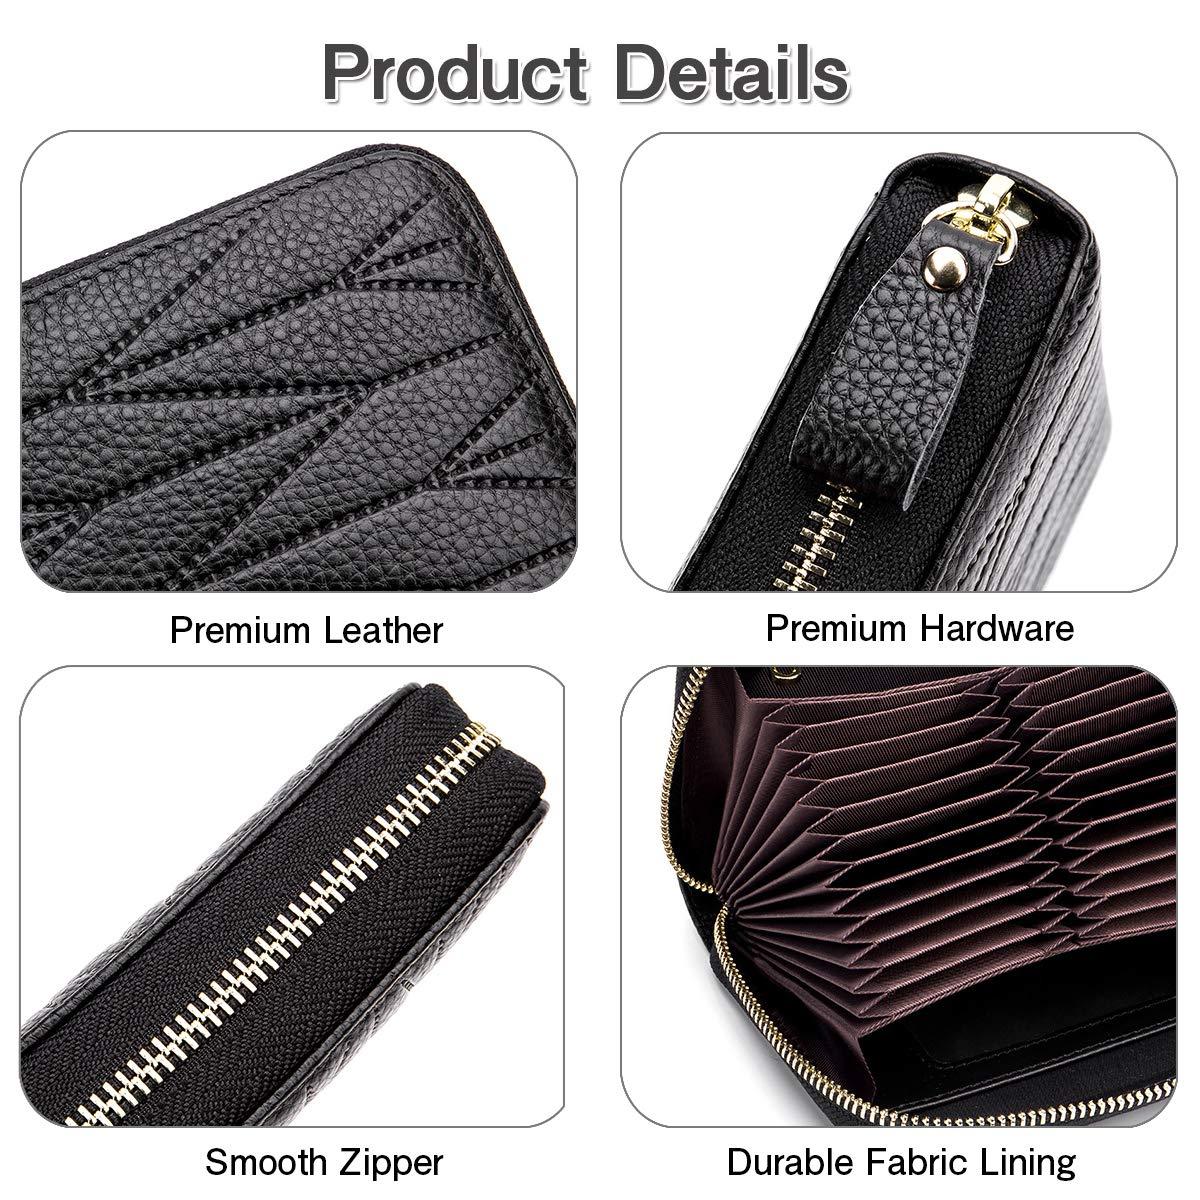 imeetu Women/men RFID Blocking Leather Credit Card Holder case Accordion Wallet 24 Slots Purses with Zipper Pocket(Wine Red) by imeetu (Image #5)